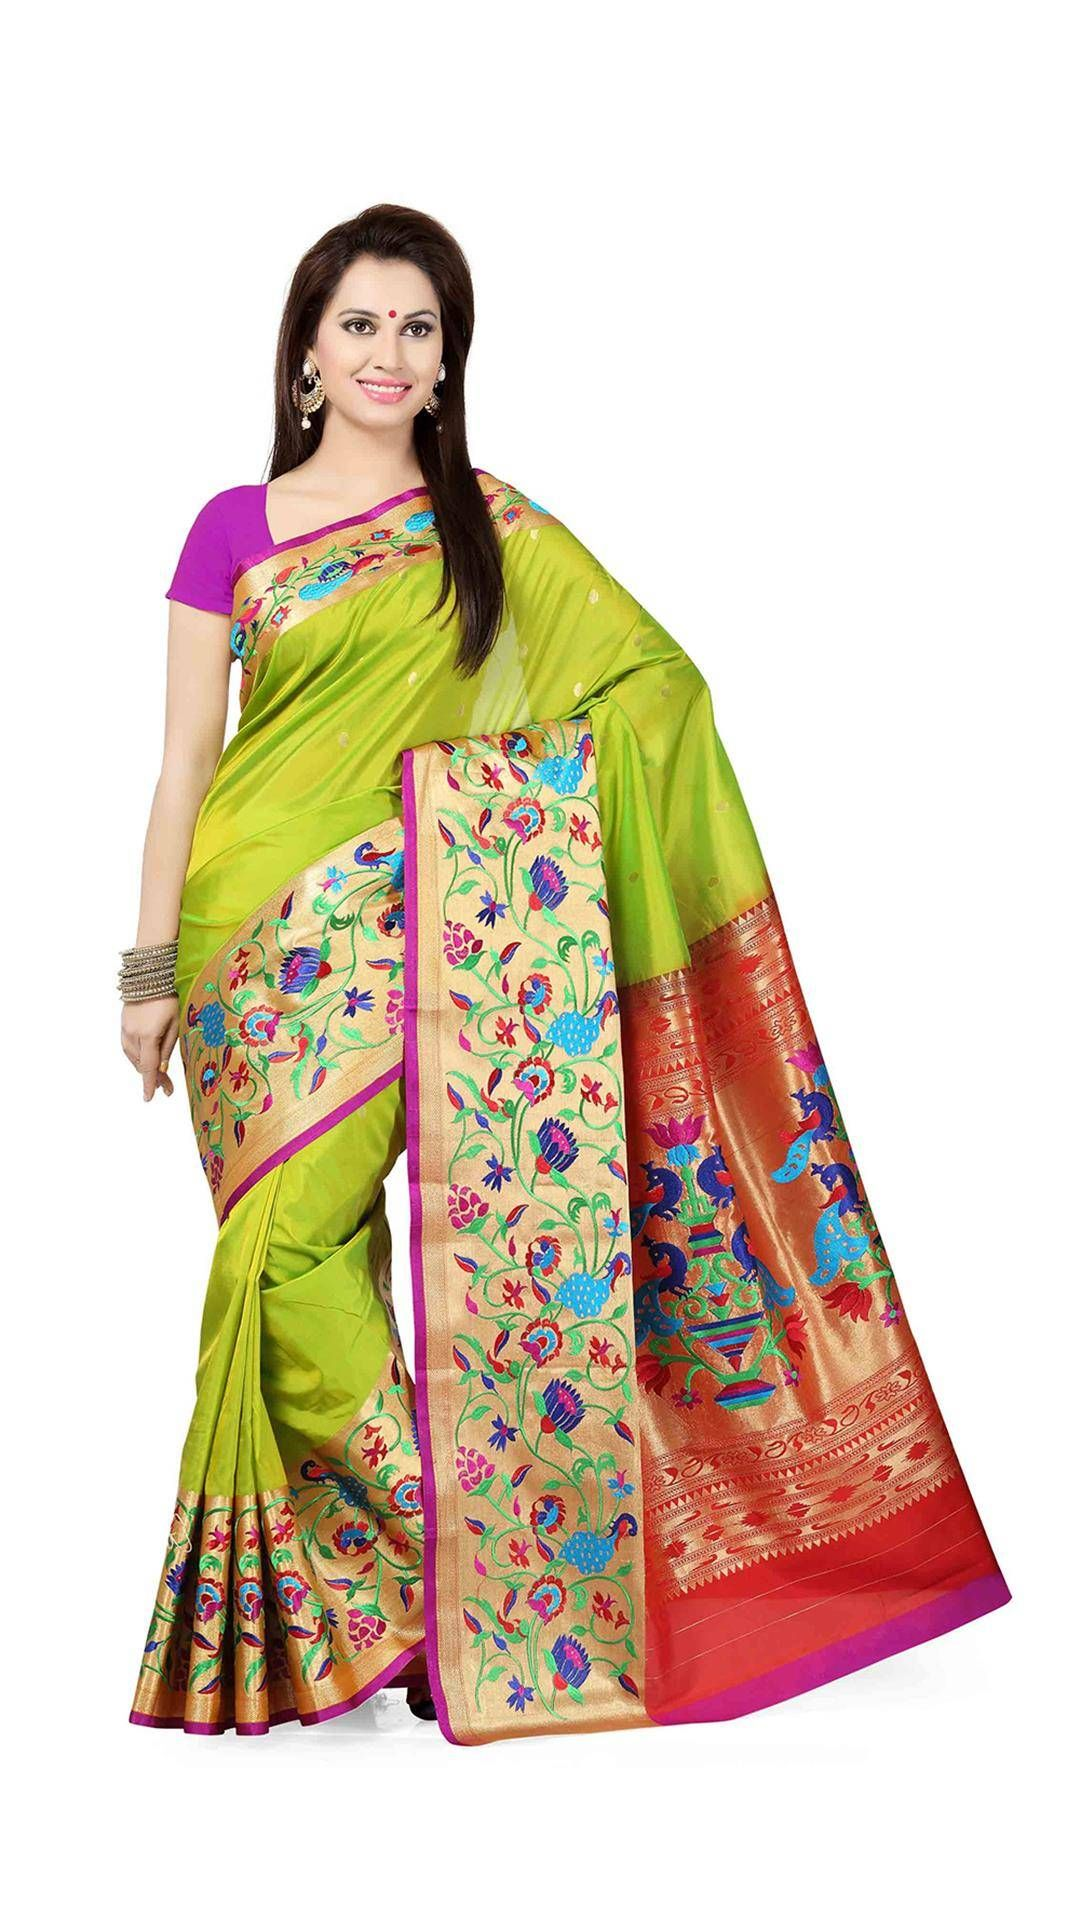 Saree images paithani ishin tana silk green u orange paithani woven party wear saree